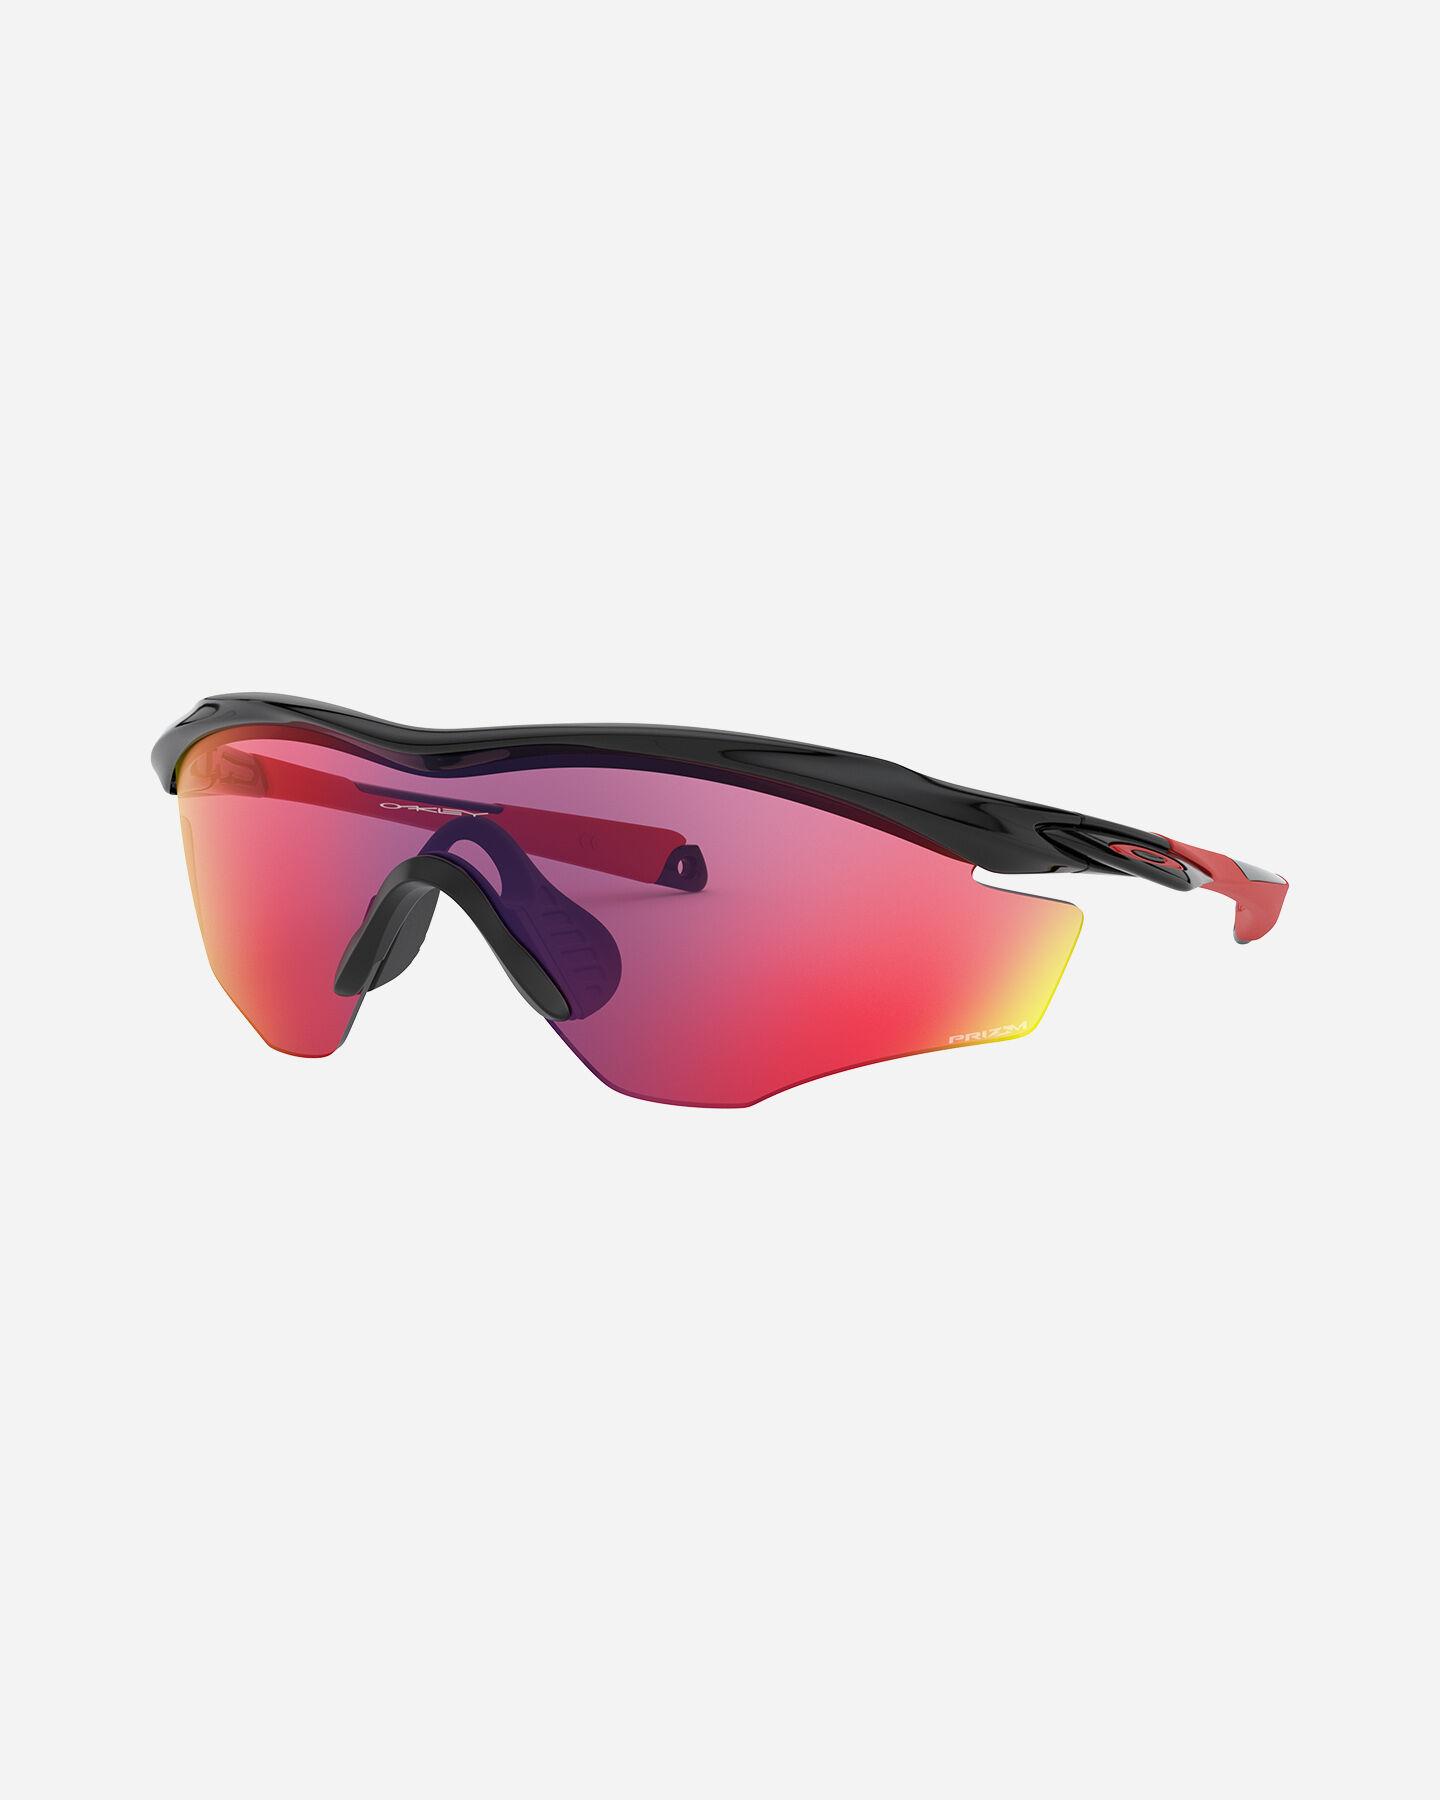 Occhiali OAKLEY M2 FRAME XL PRIZM S1313254|9999|UNI scatto 0